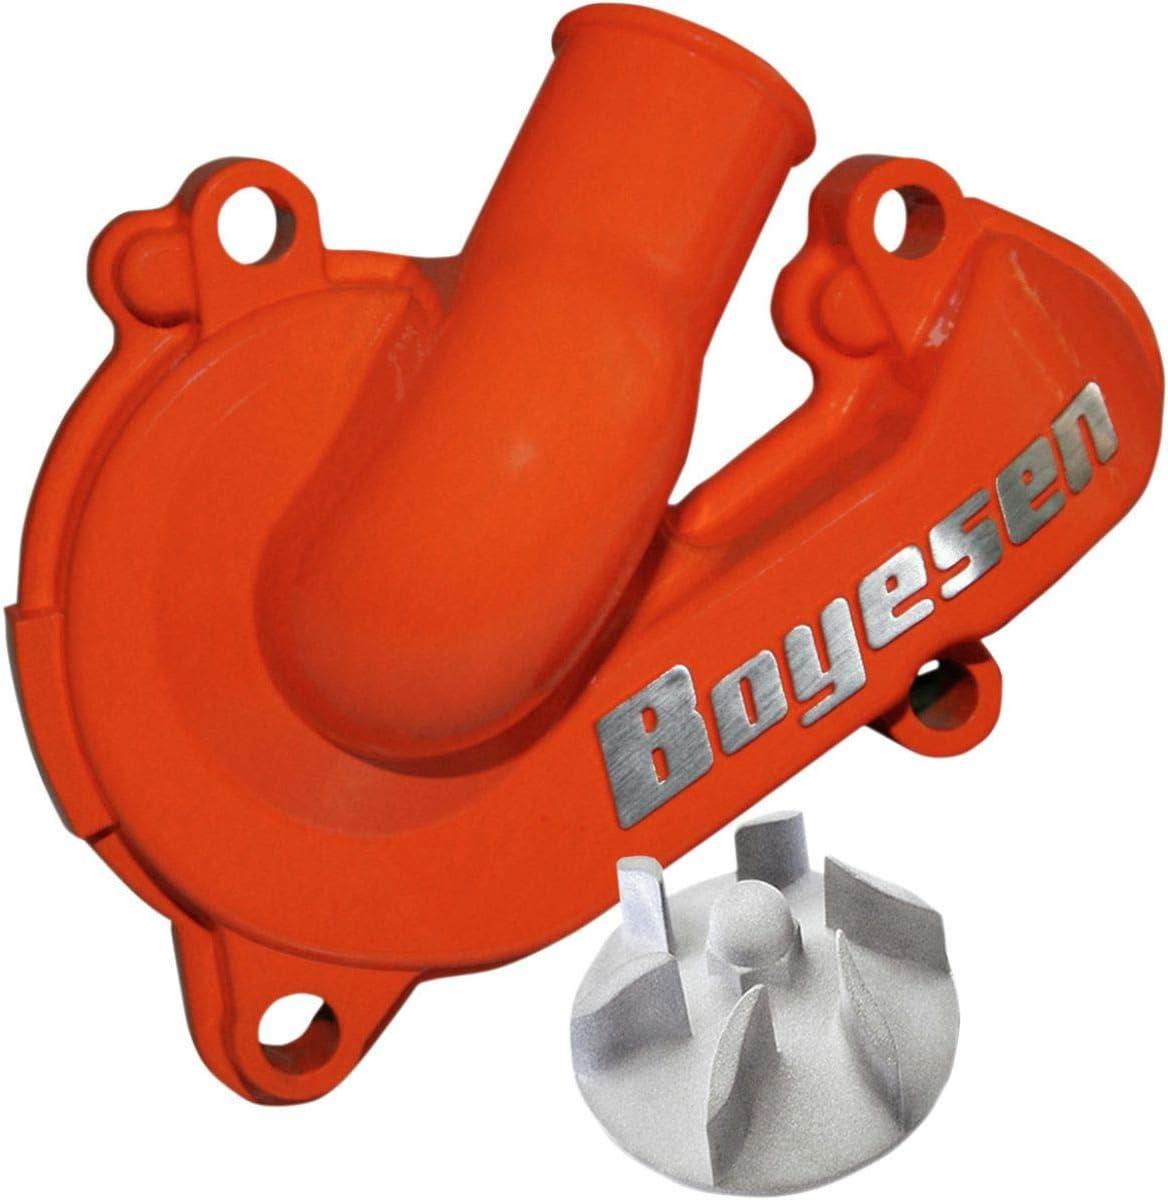 Boyesen WPK-44O Supercooler Water Pump Cover and Impeller Kit Orange